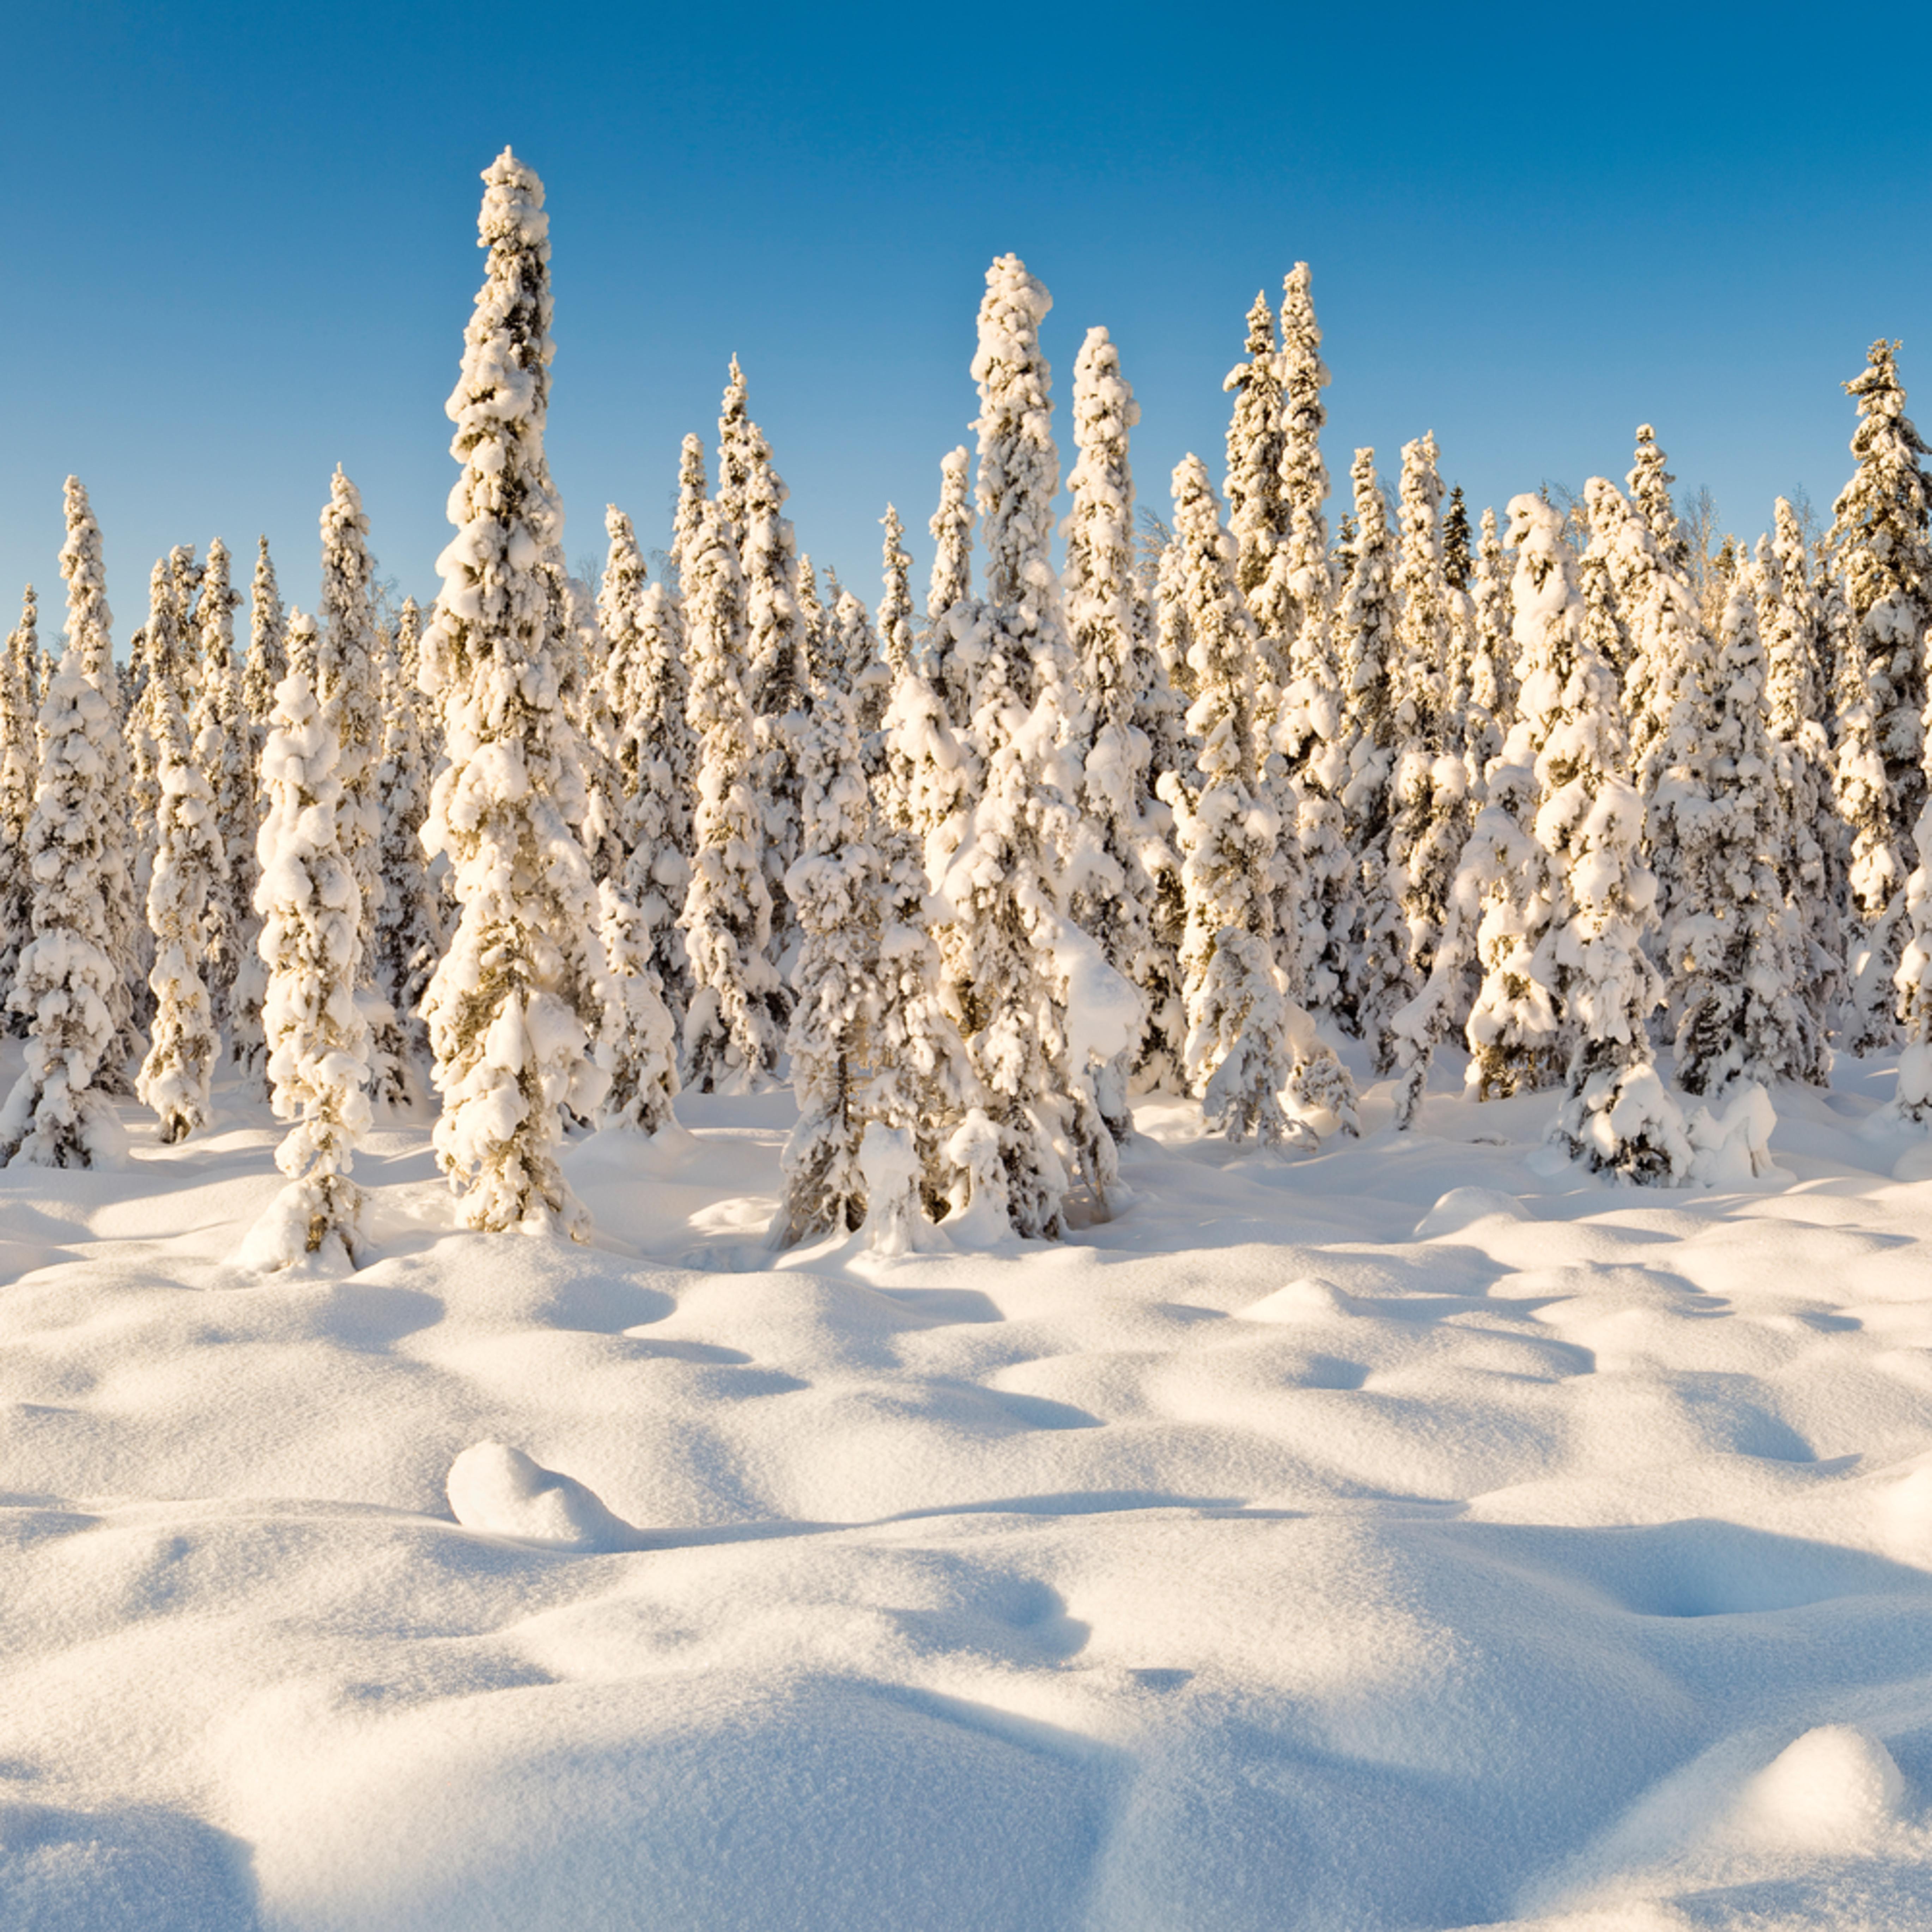 Chugiak winter pano1a artstorefronts edcvcx